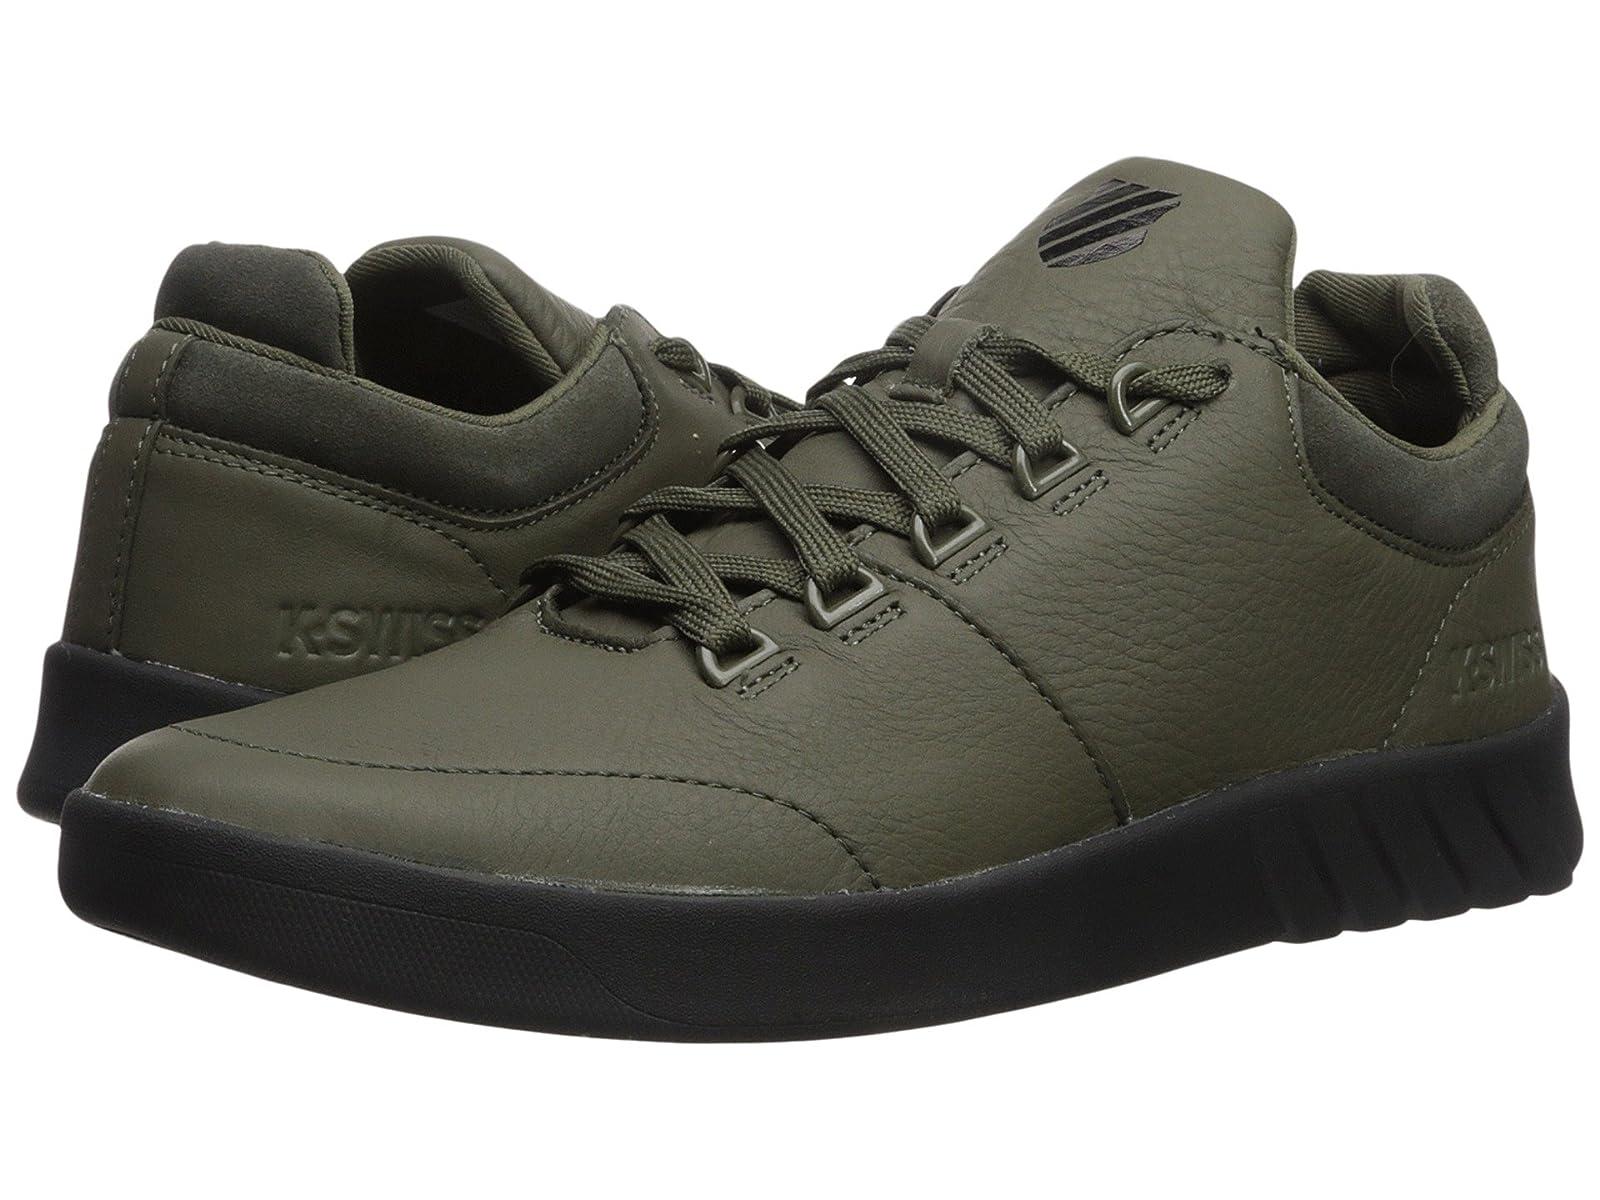 K-Swiss Aero Trainer SECheap and distinctive eye-catching shoes